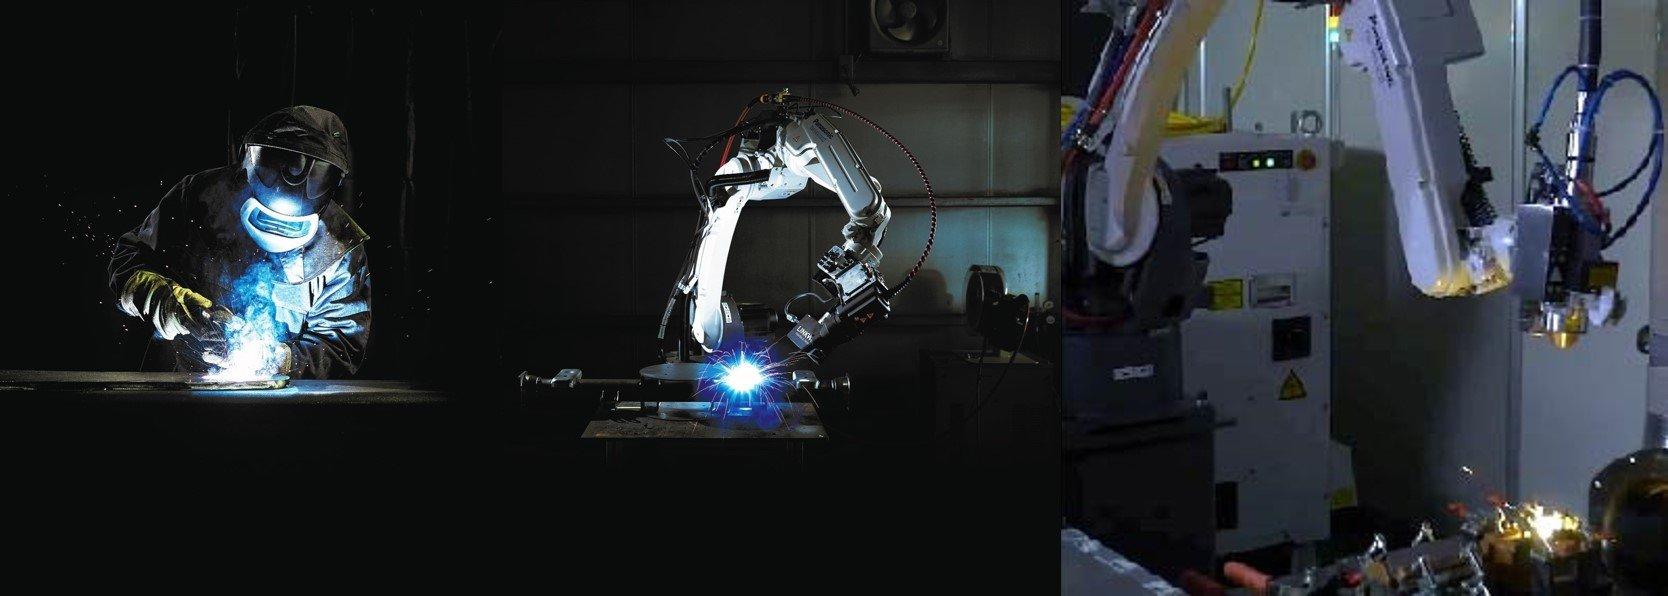 Photo: Panasonic's main welding machines, welding robots and laser welding products